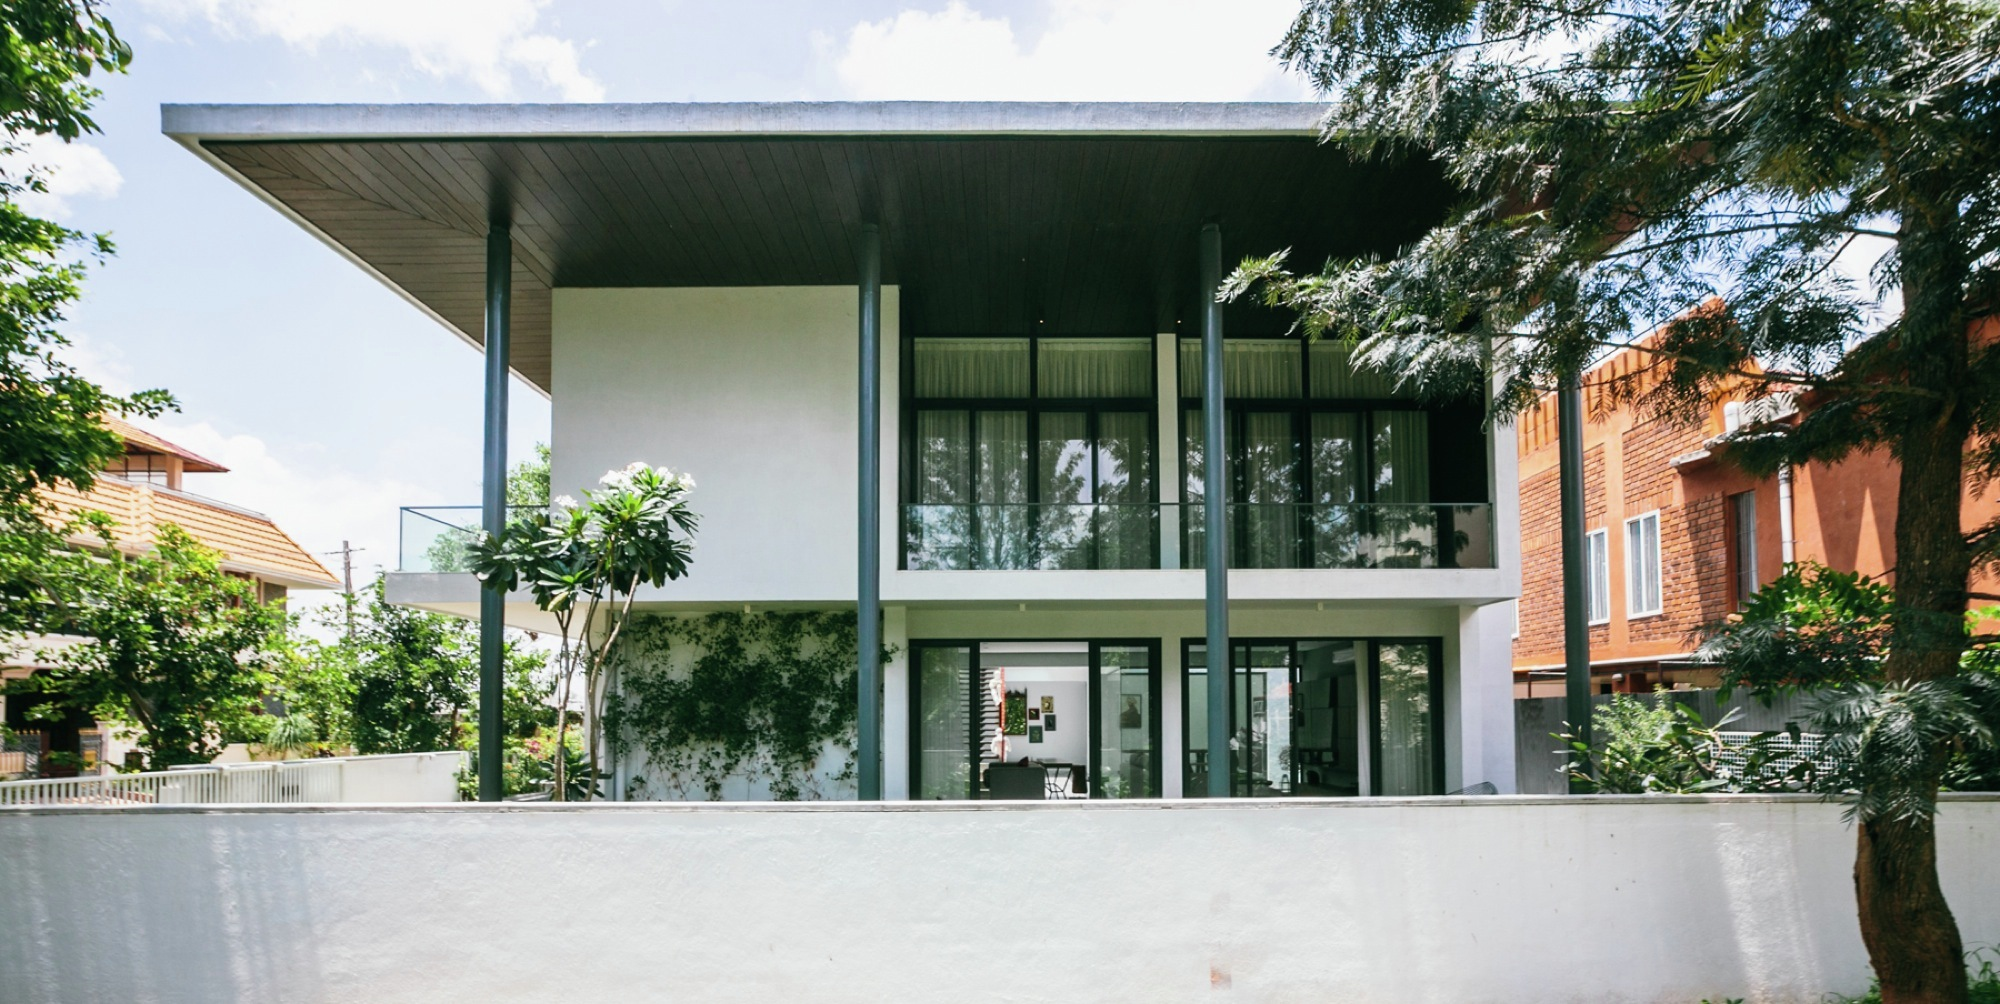 Gallery of courtyard house abin design studio 15 for Courtyard houses design ideas